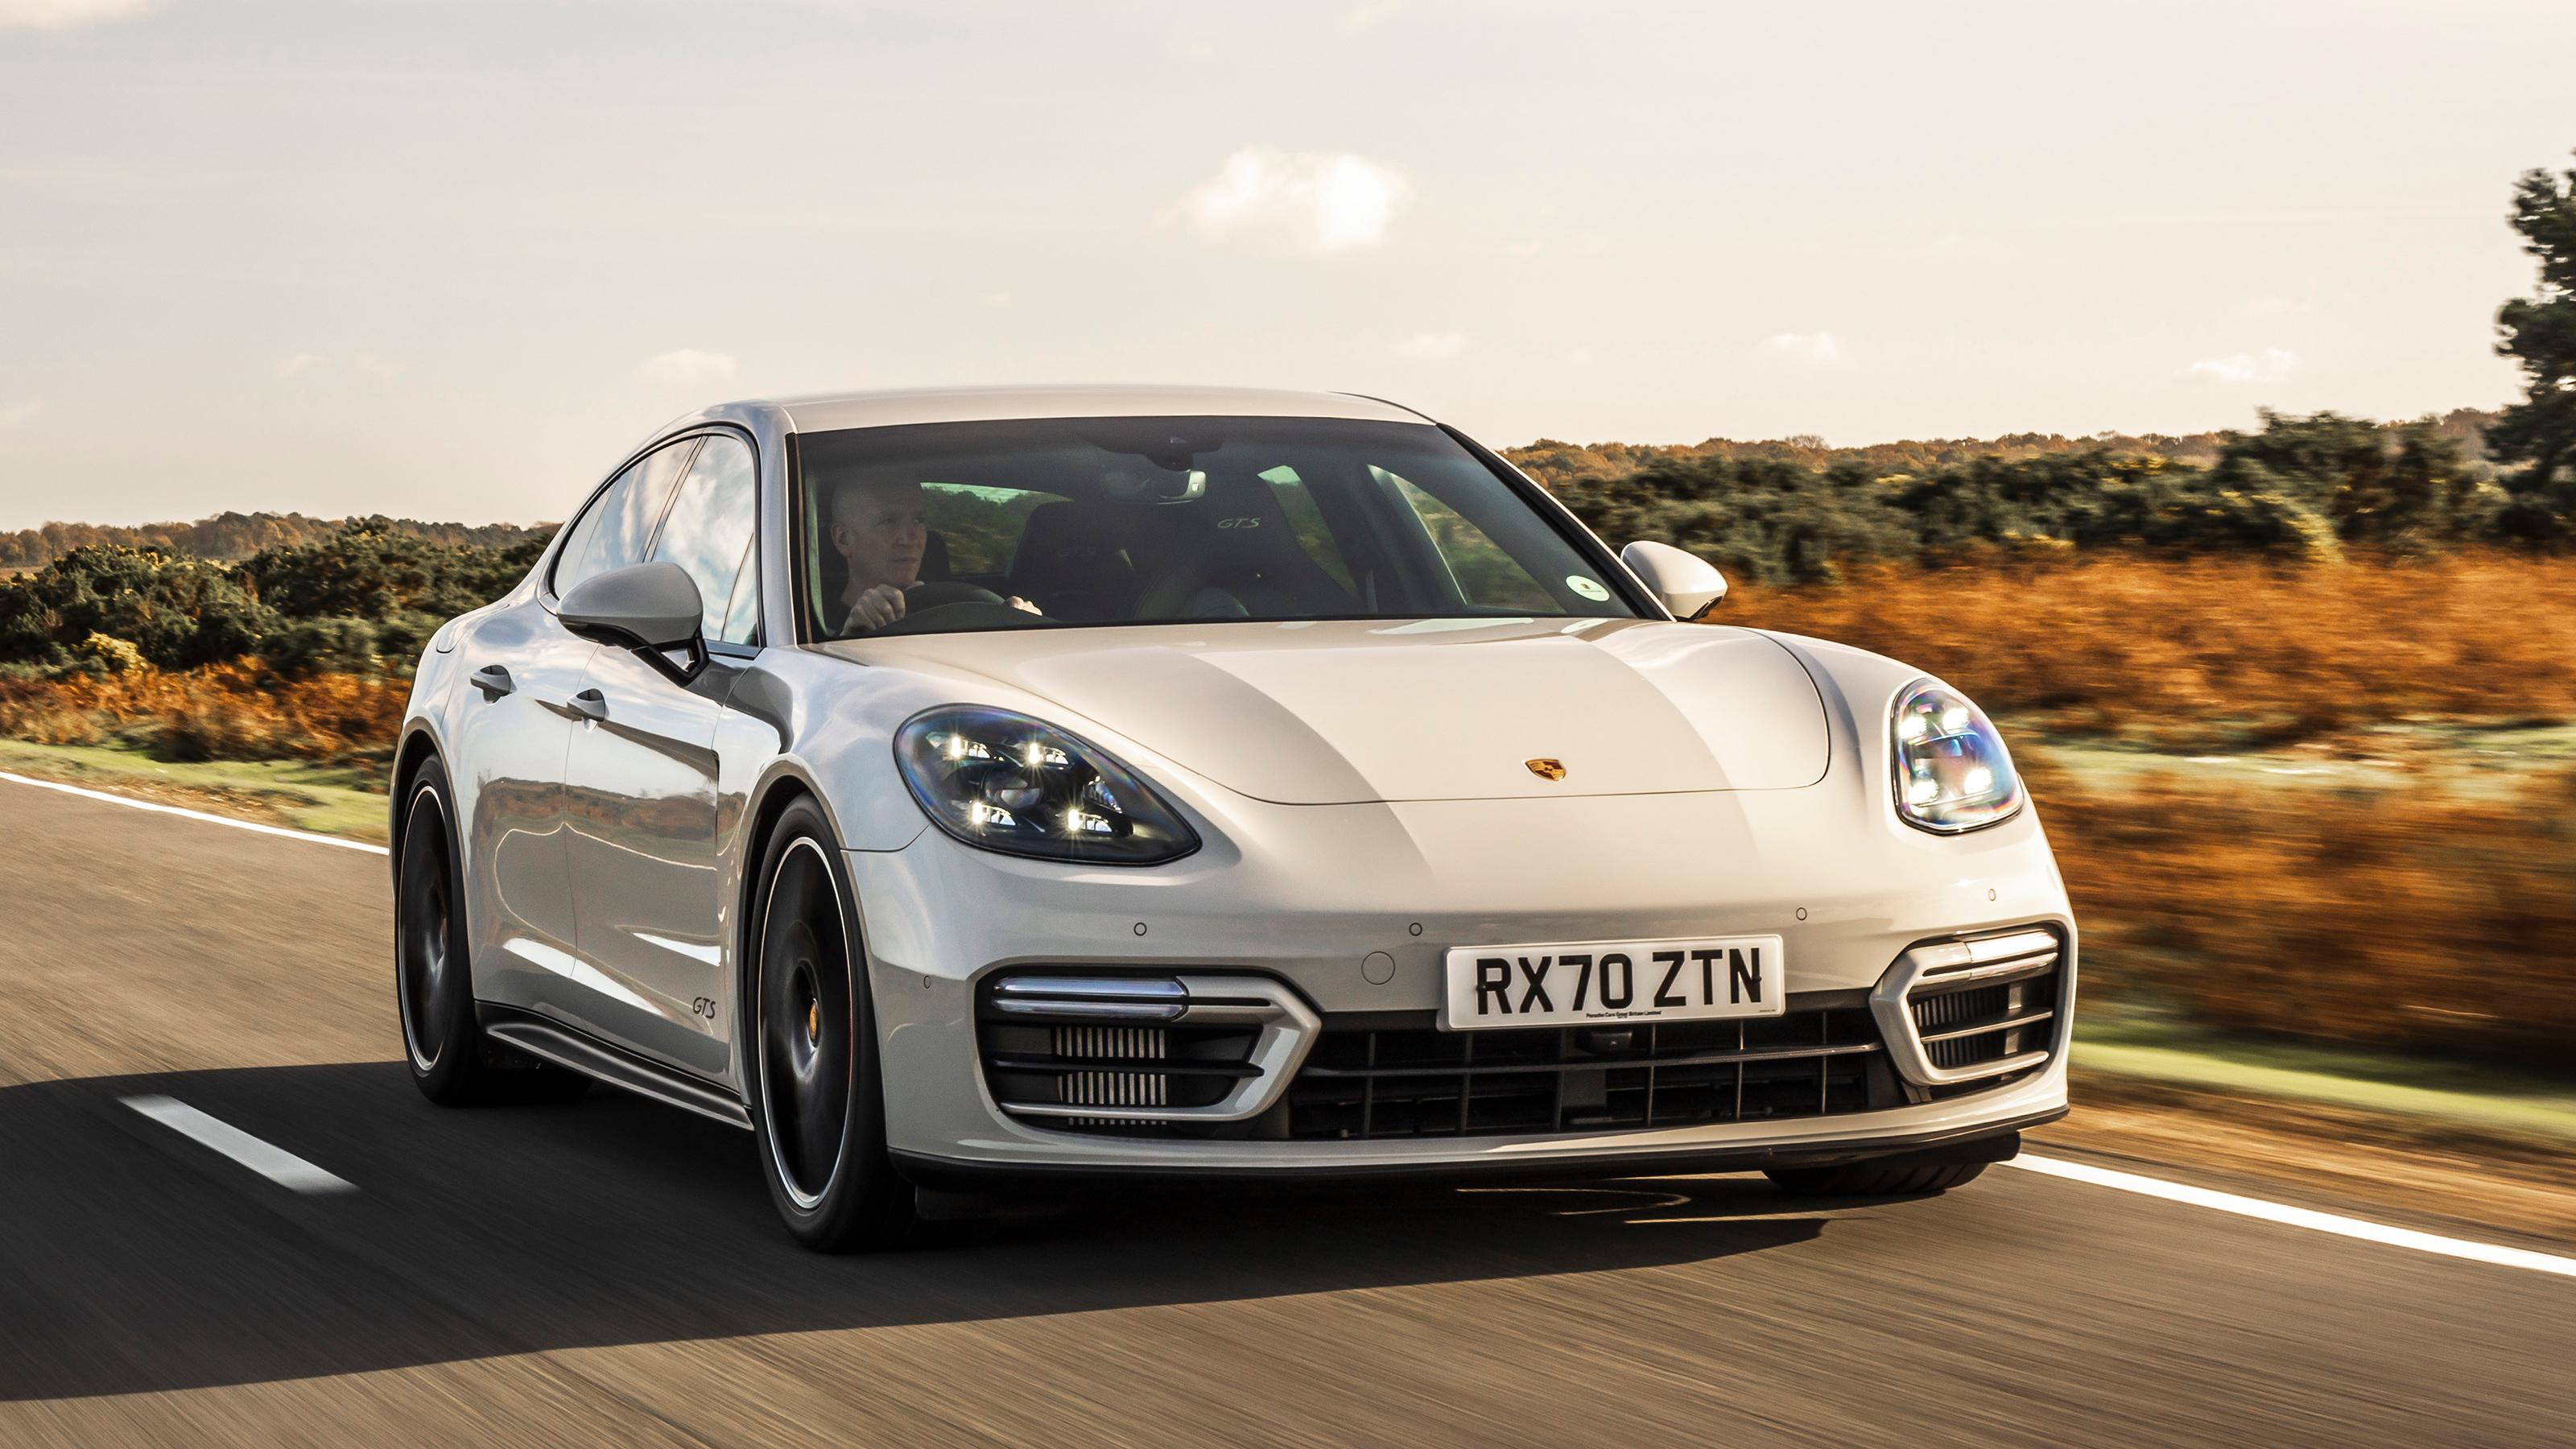 New Porsche Panamera GTS 2020 review | Auto Express